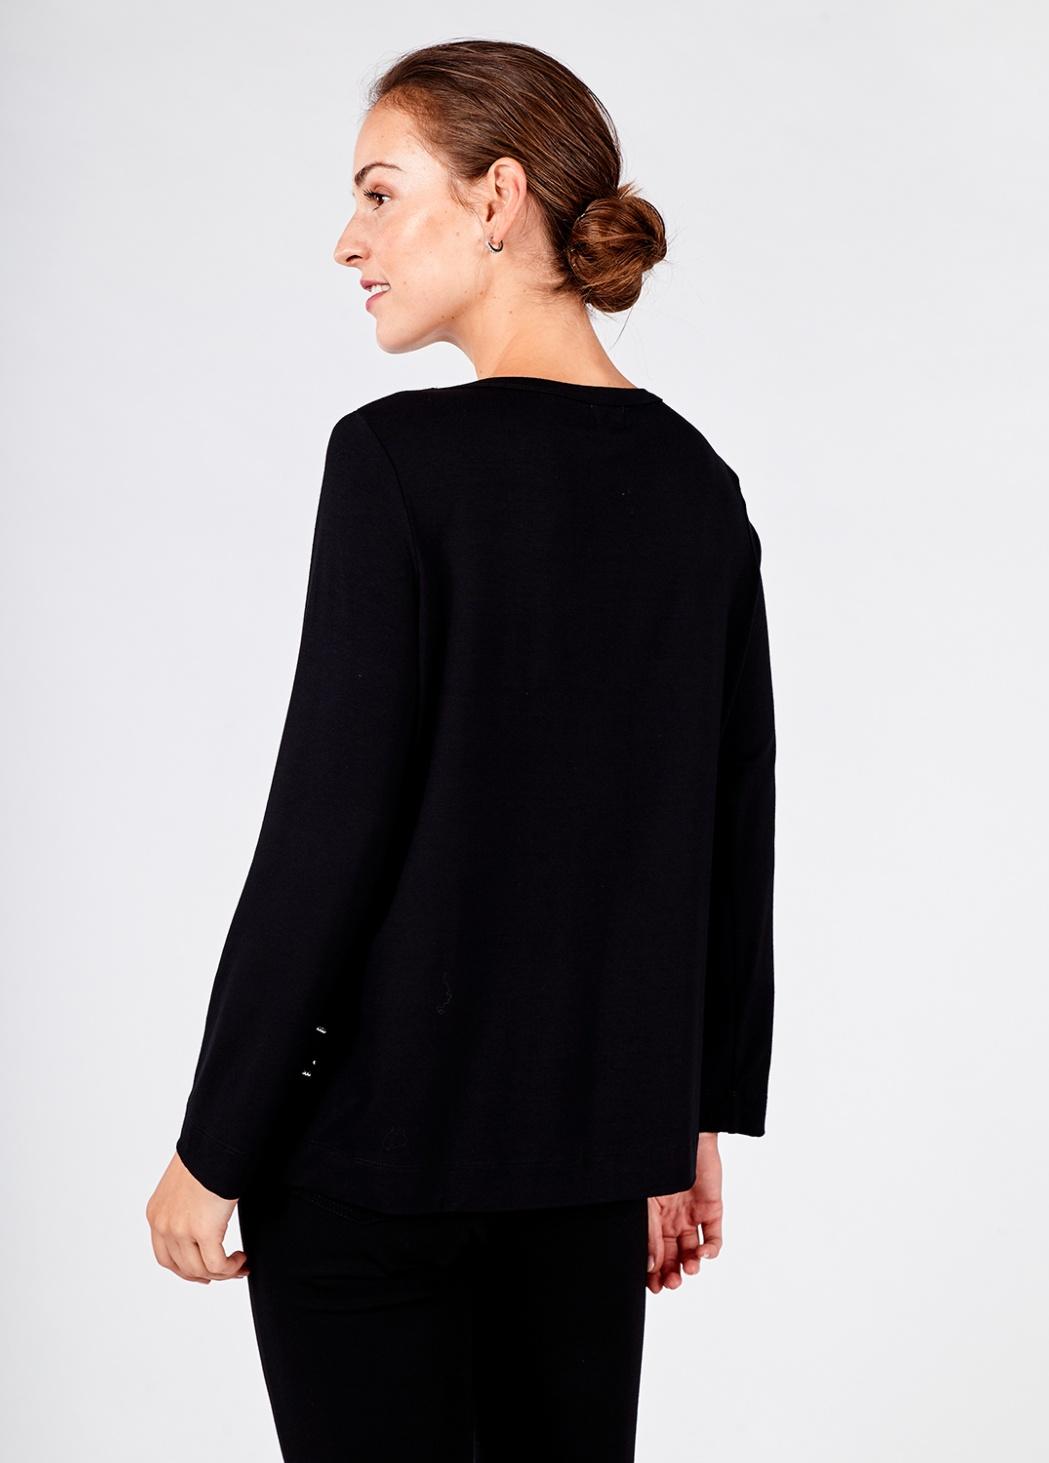 Camiseta Negra Pallete 3